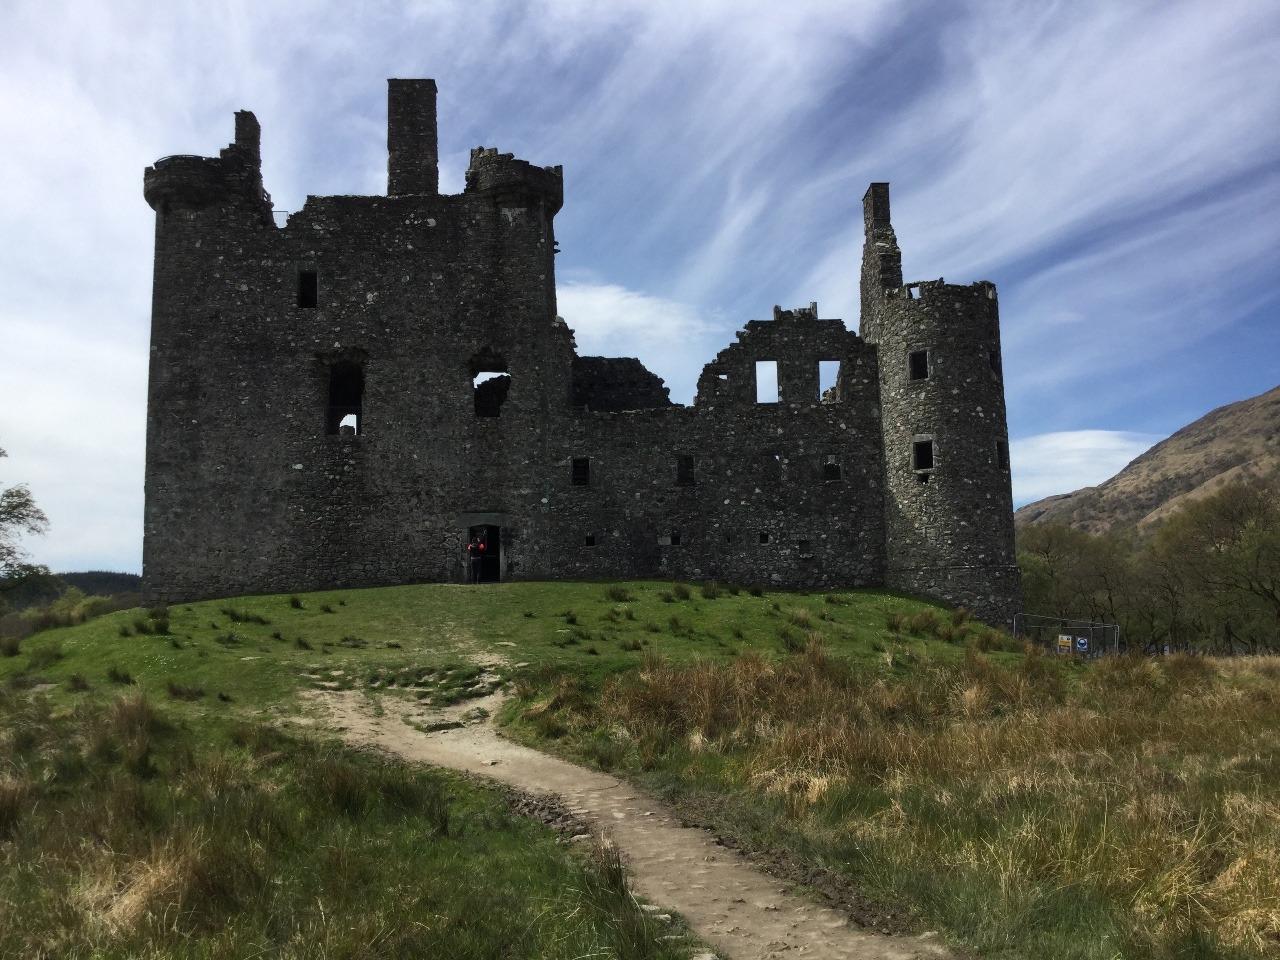 Kilchurn Castle (pronounced Kill-hern)